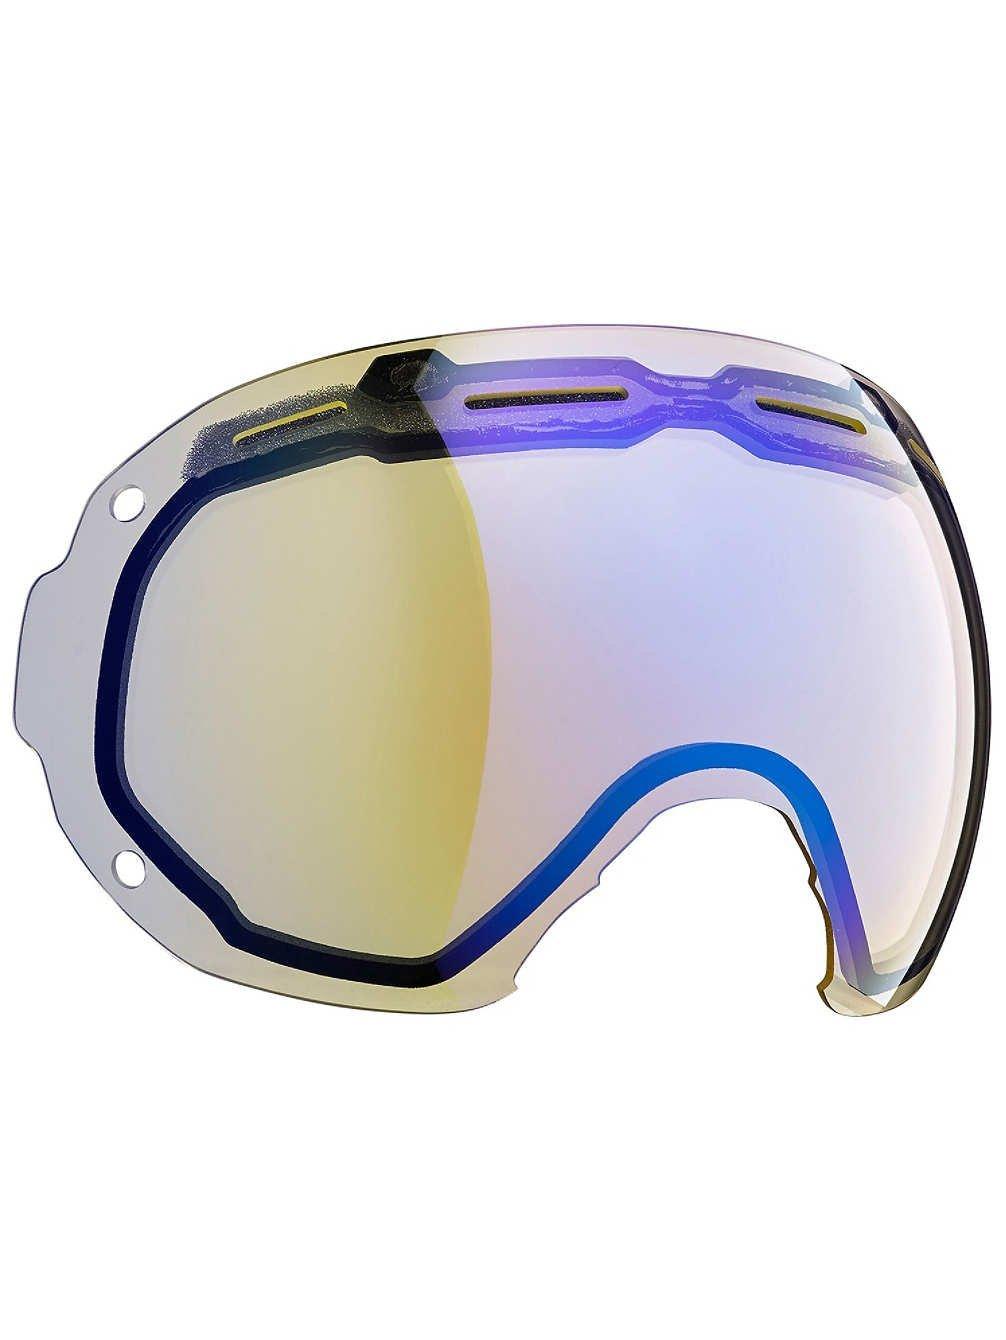 Bern 2016 / 17ジャクソン/ Juno Mediumフレーム冬雪ゴーグル交換レンズ B017JOOVAO  Yellow/Blue Light Mirror One Size